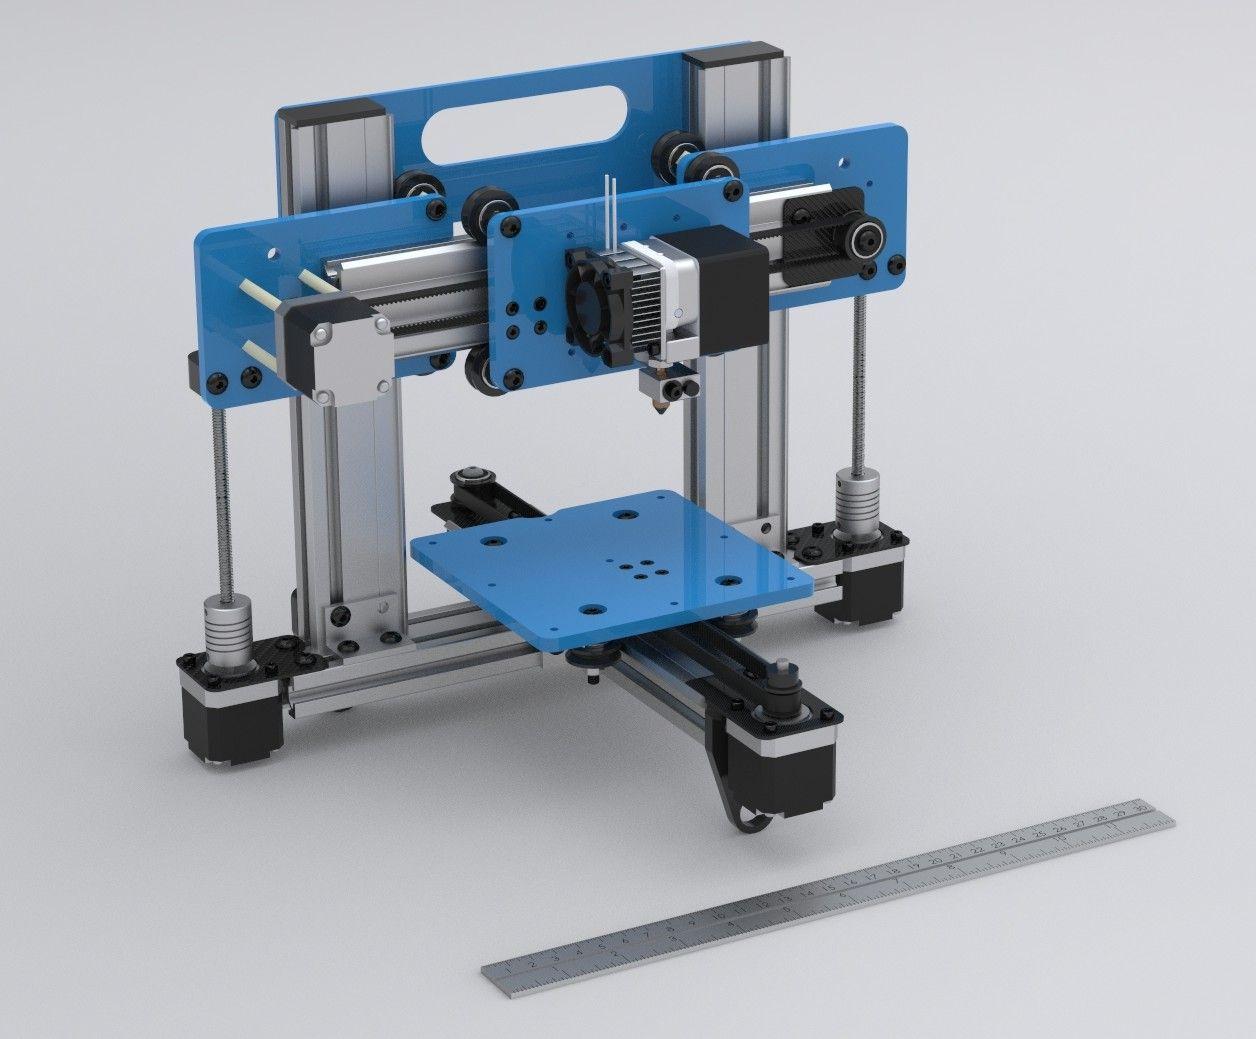 A 3d Printer Built With Makerslide Small 3d Printer 3d Printer 3d Printing